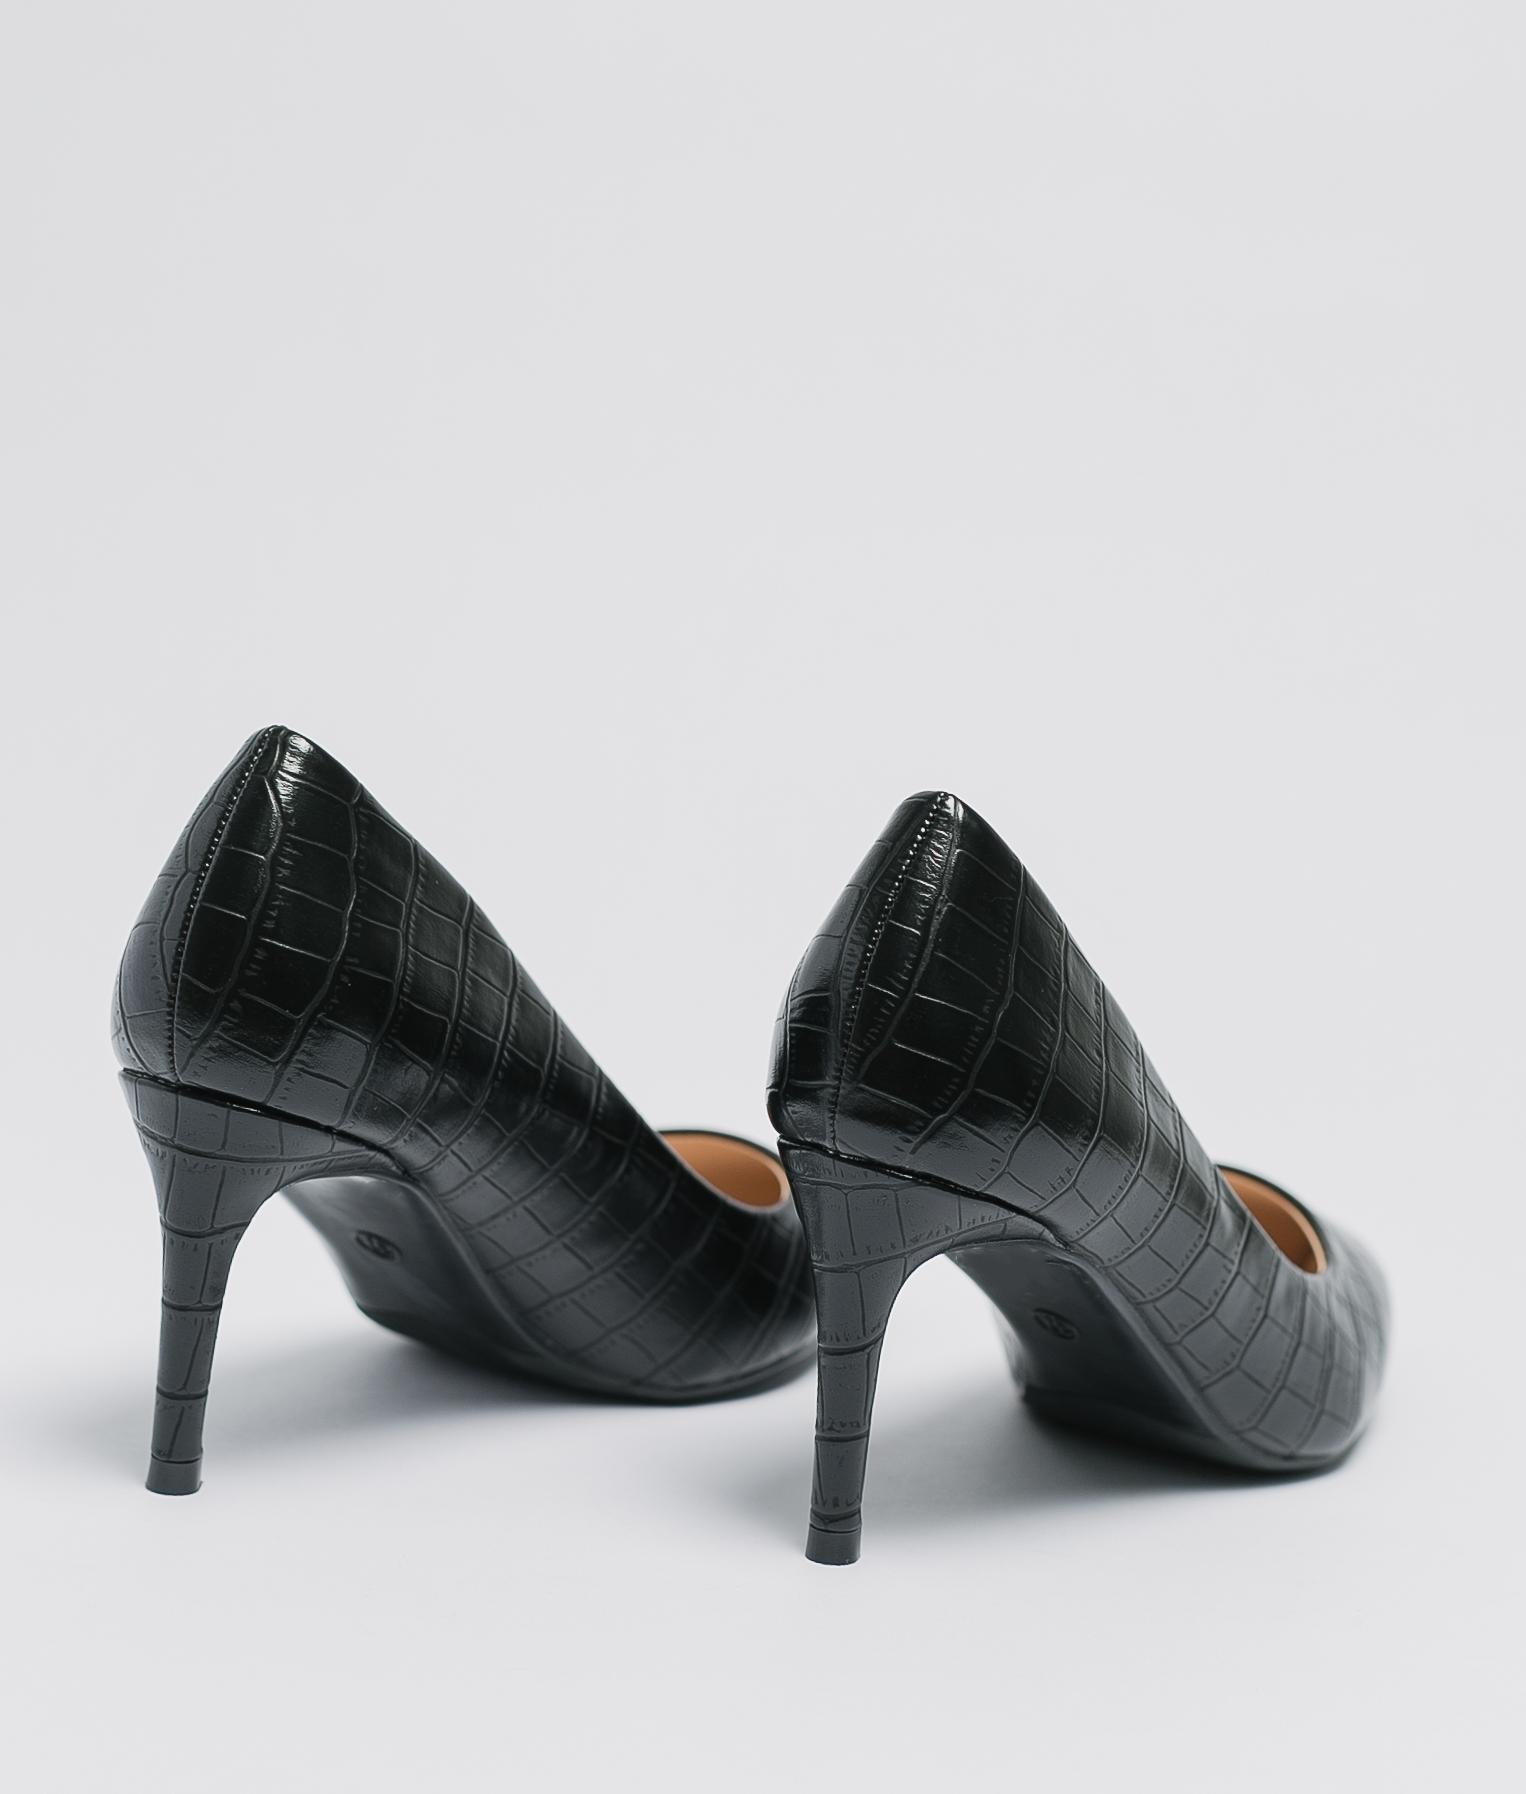 Zapato Gisele - Black